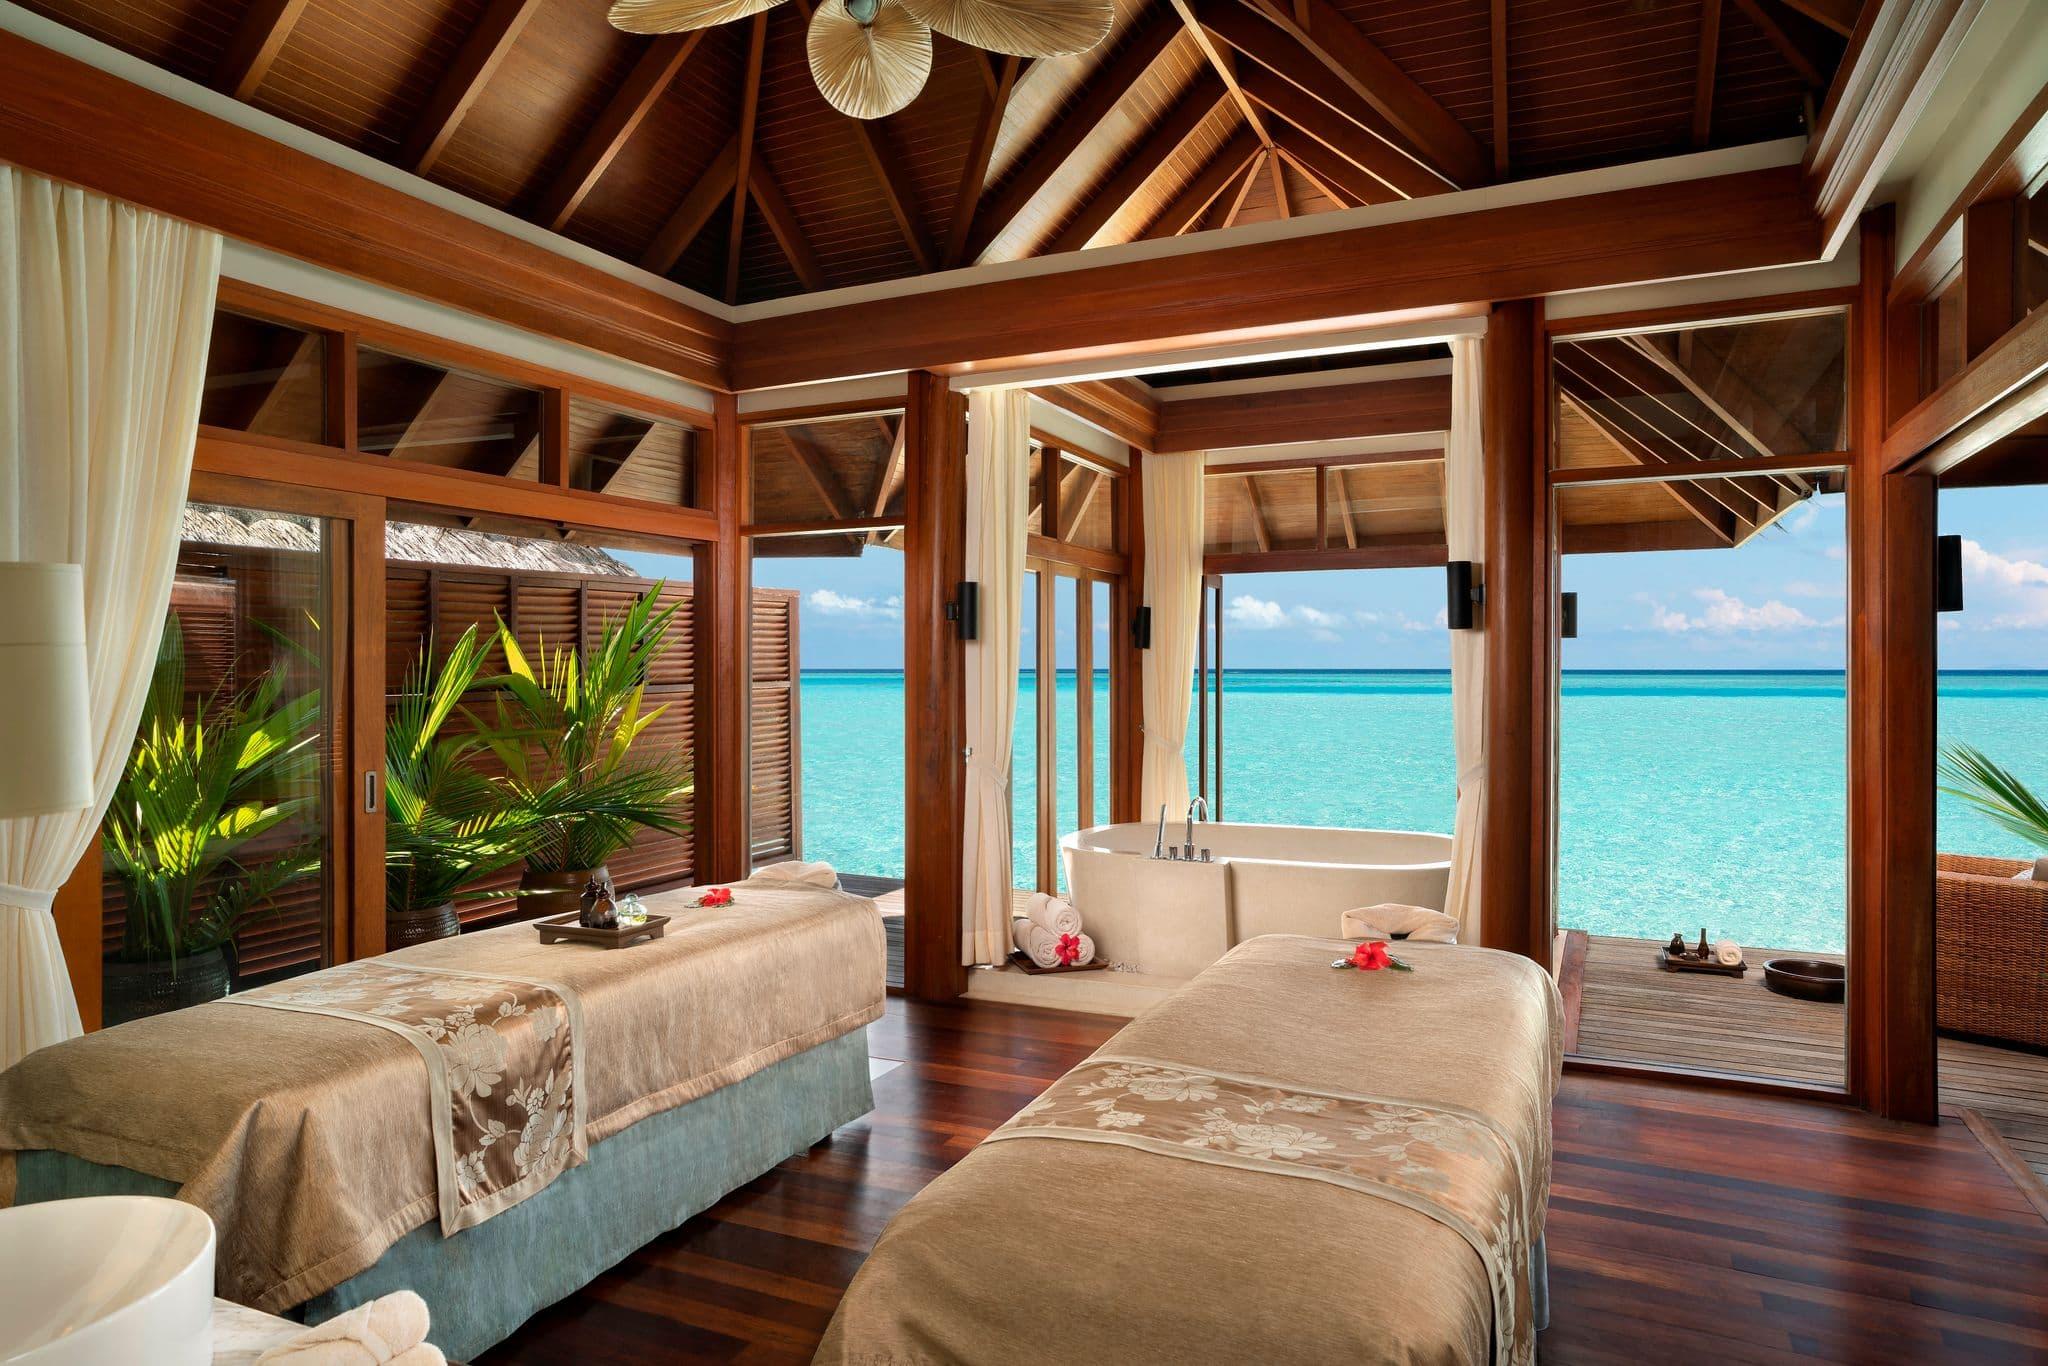 Reisen in Style Magazin - Malediven Bucketlist - Wellness Spa Malediven